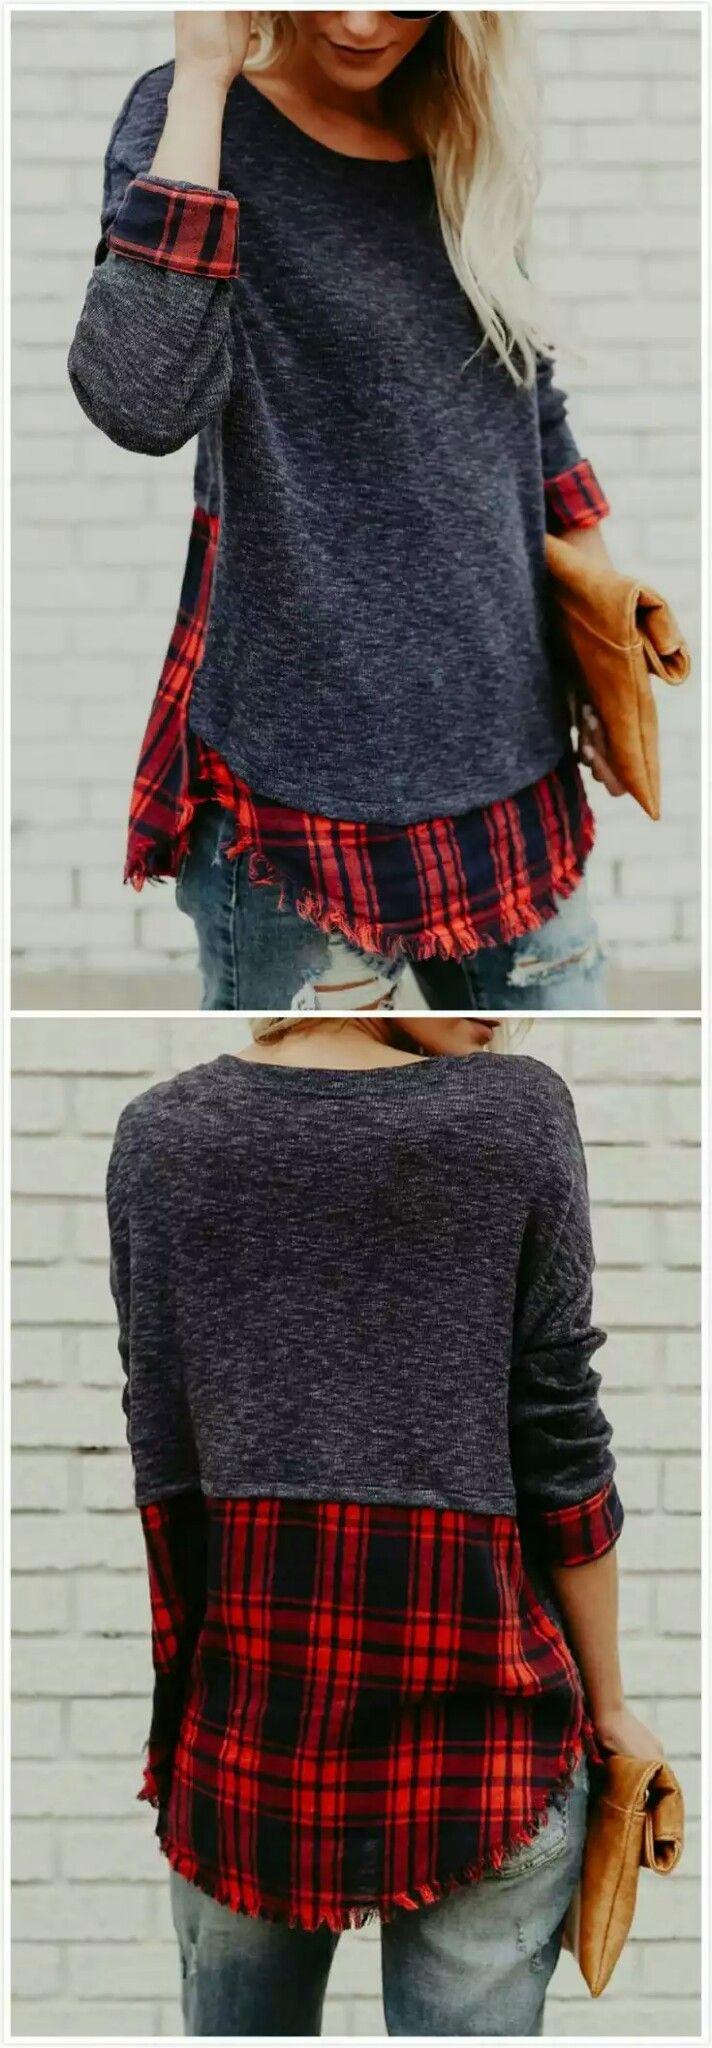 Flannel shirt ideas  Possible sweat shirt refashion idea  Clothes  Ideas u Makeovers